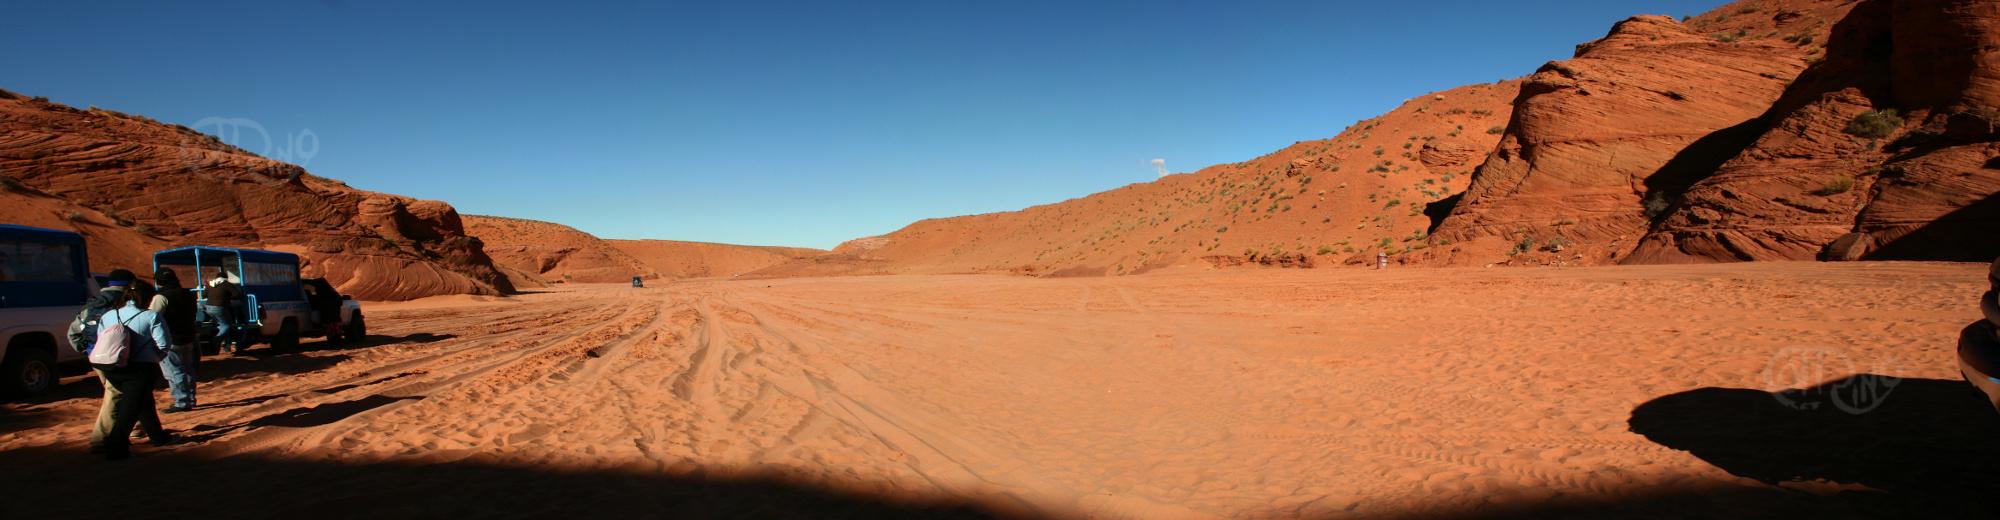 Antelope Canyon - Desierto